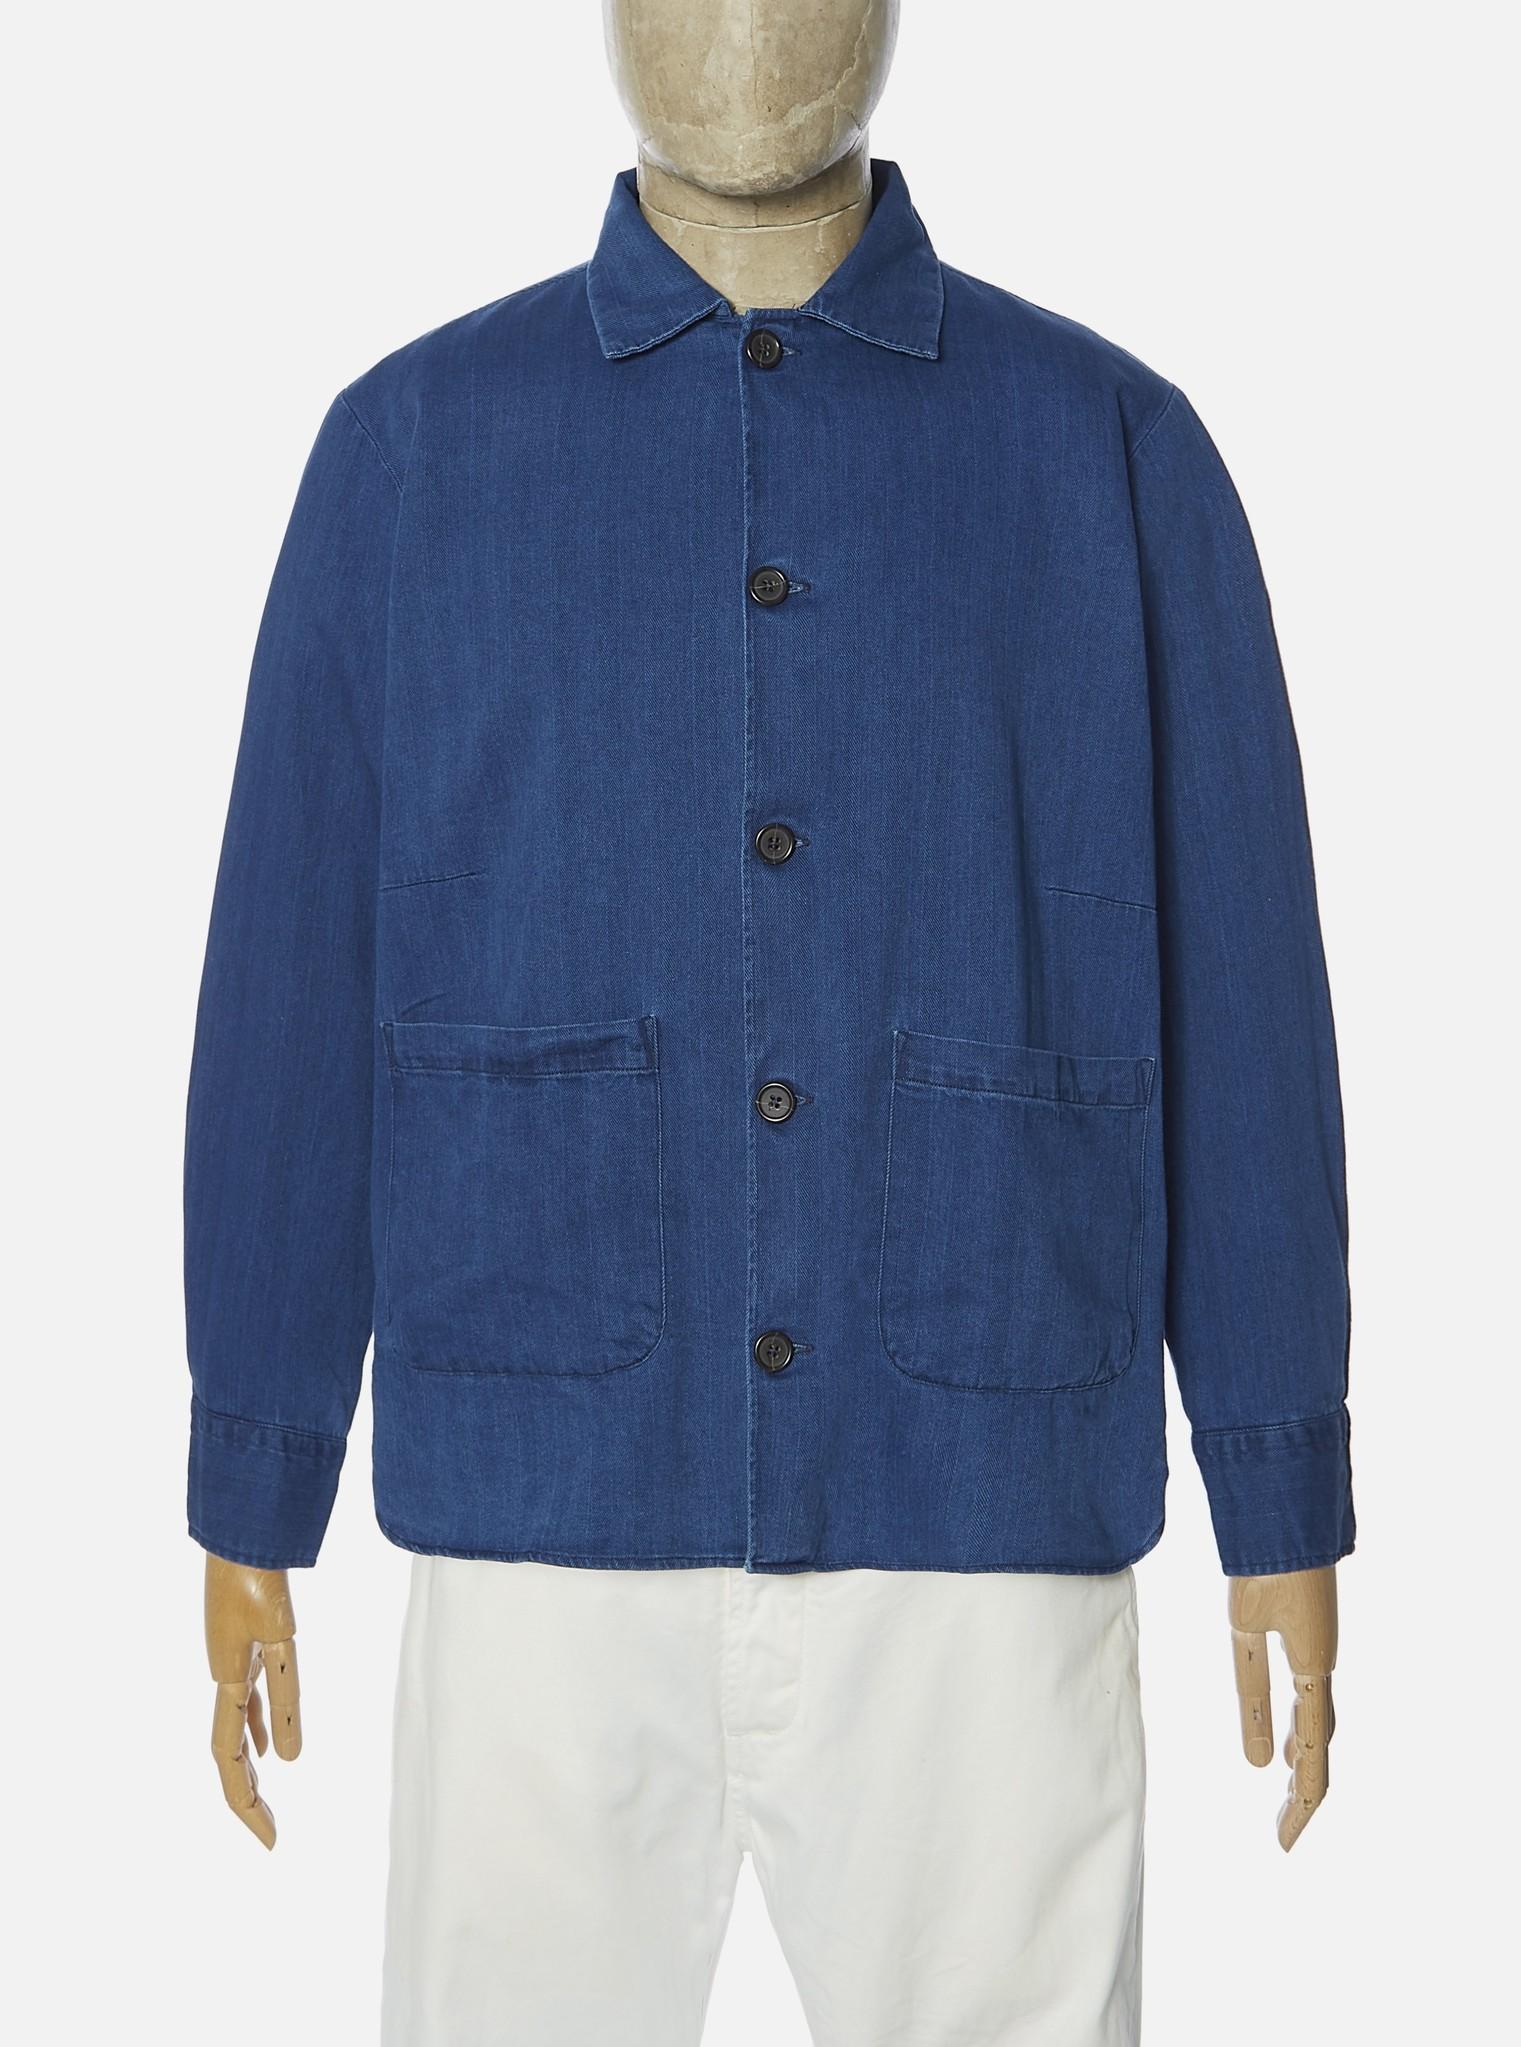 Travail Blue Shirt Washed Indigo-1